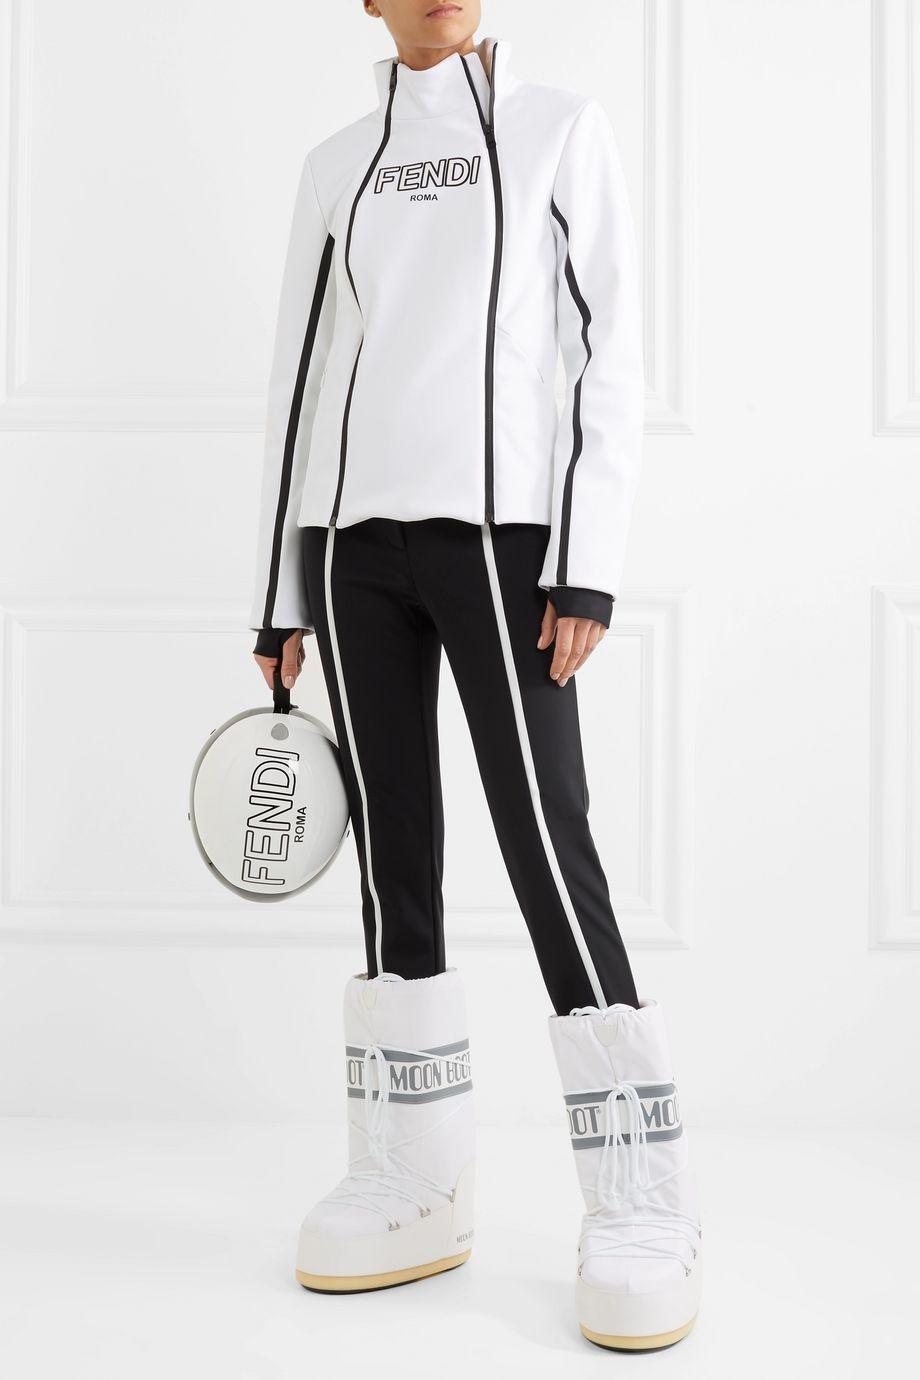 Fendi Roma printed stretch jacket